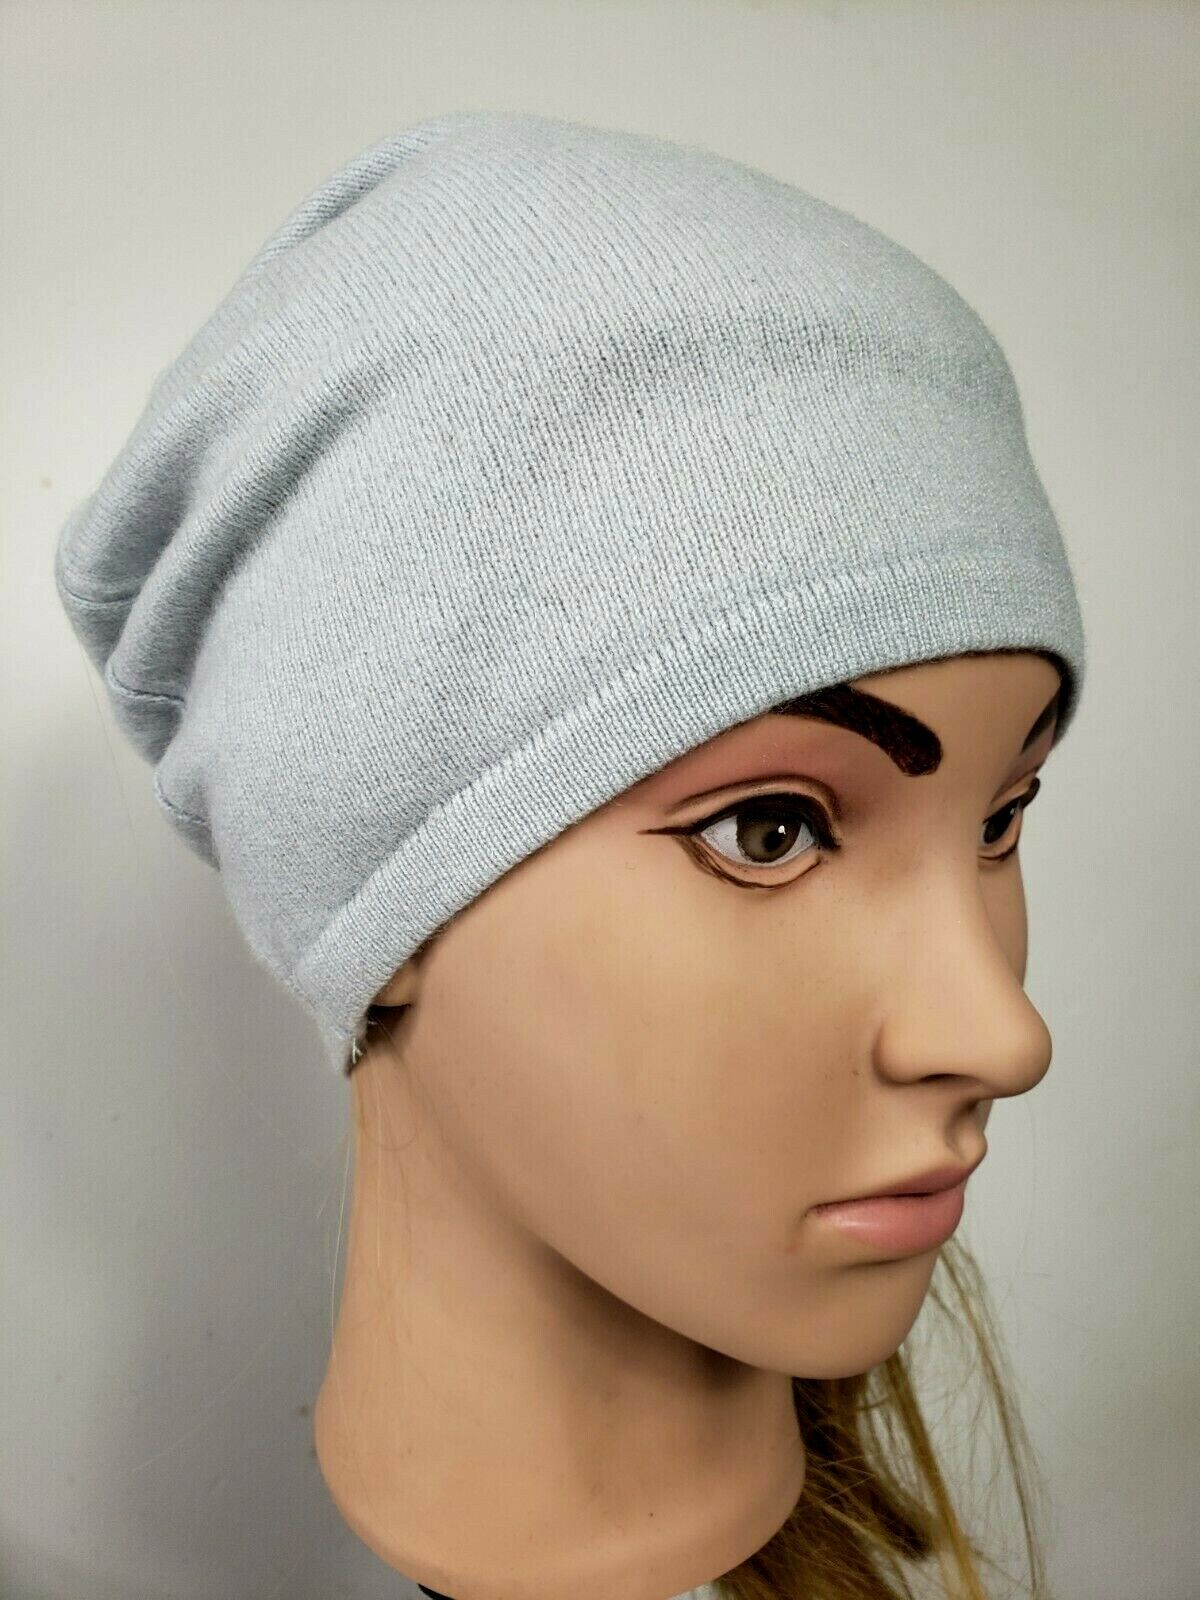 # 100% Pure Cashmere Sombrero Gorro de Lana Hombre Mujer Unisex Azul Pálido hecha a mano 222